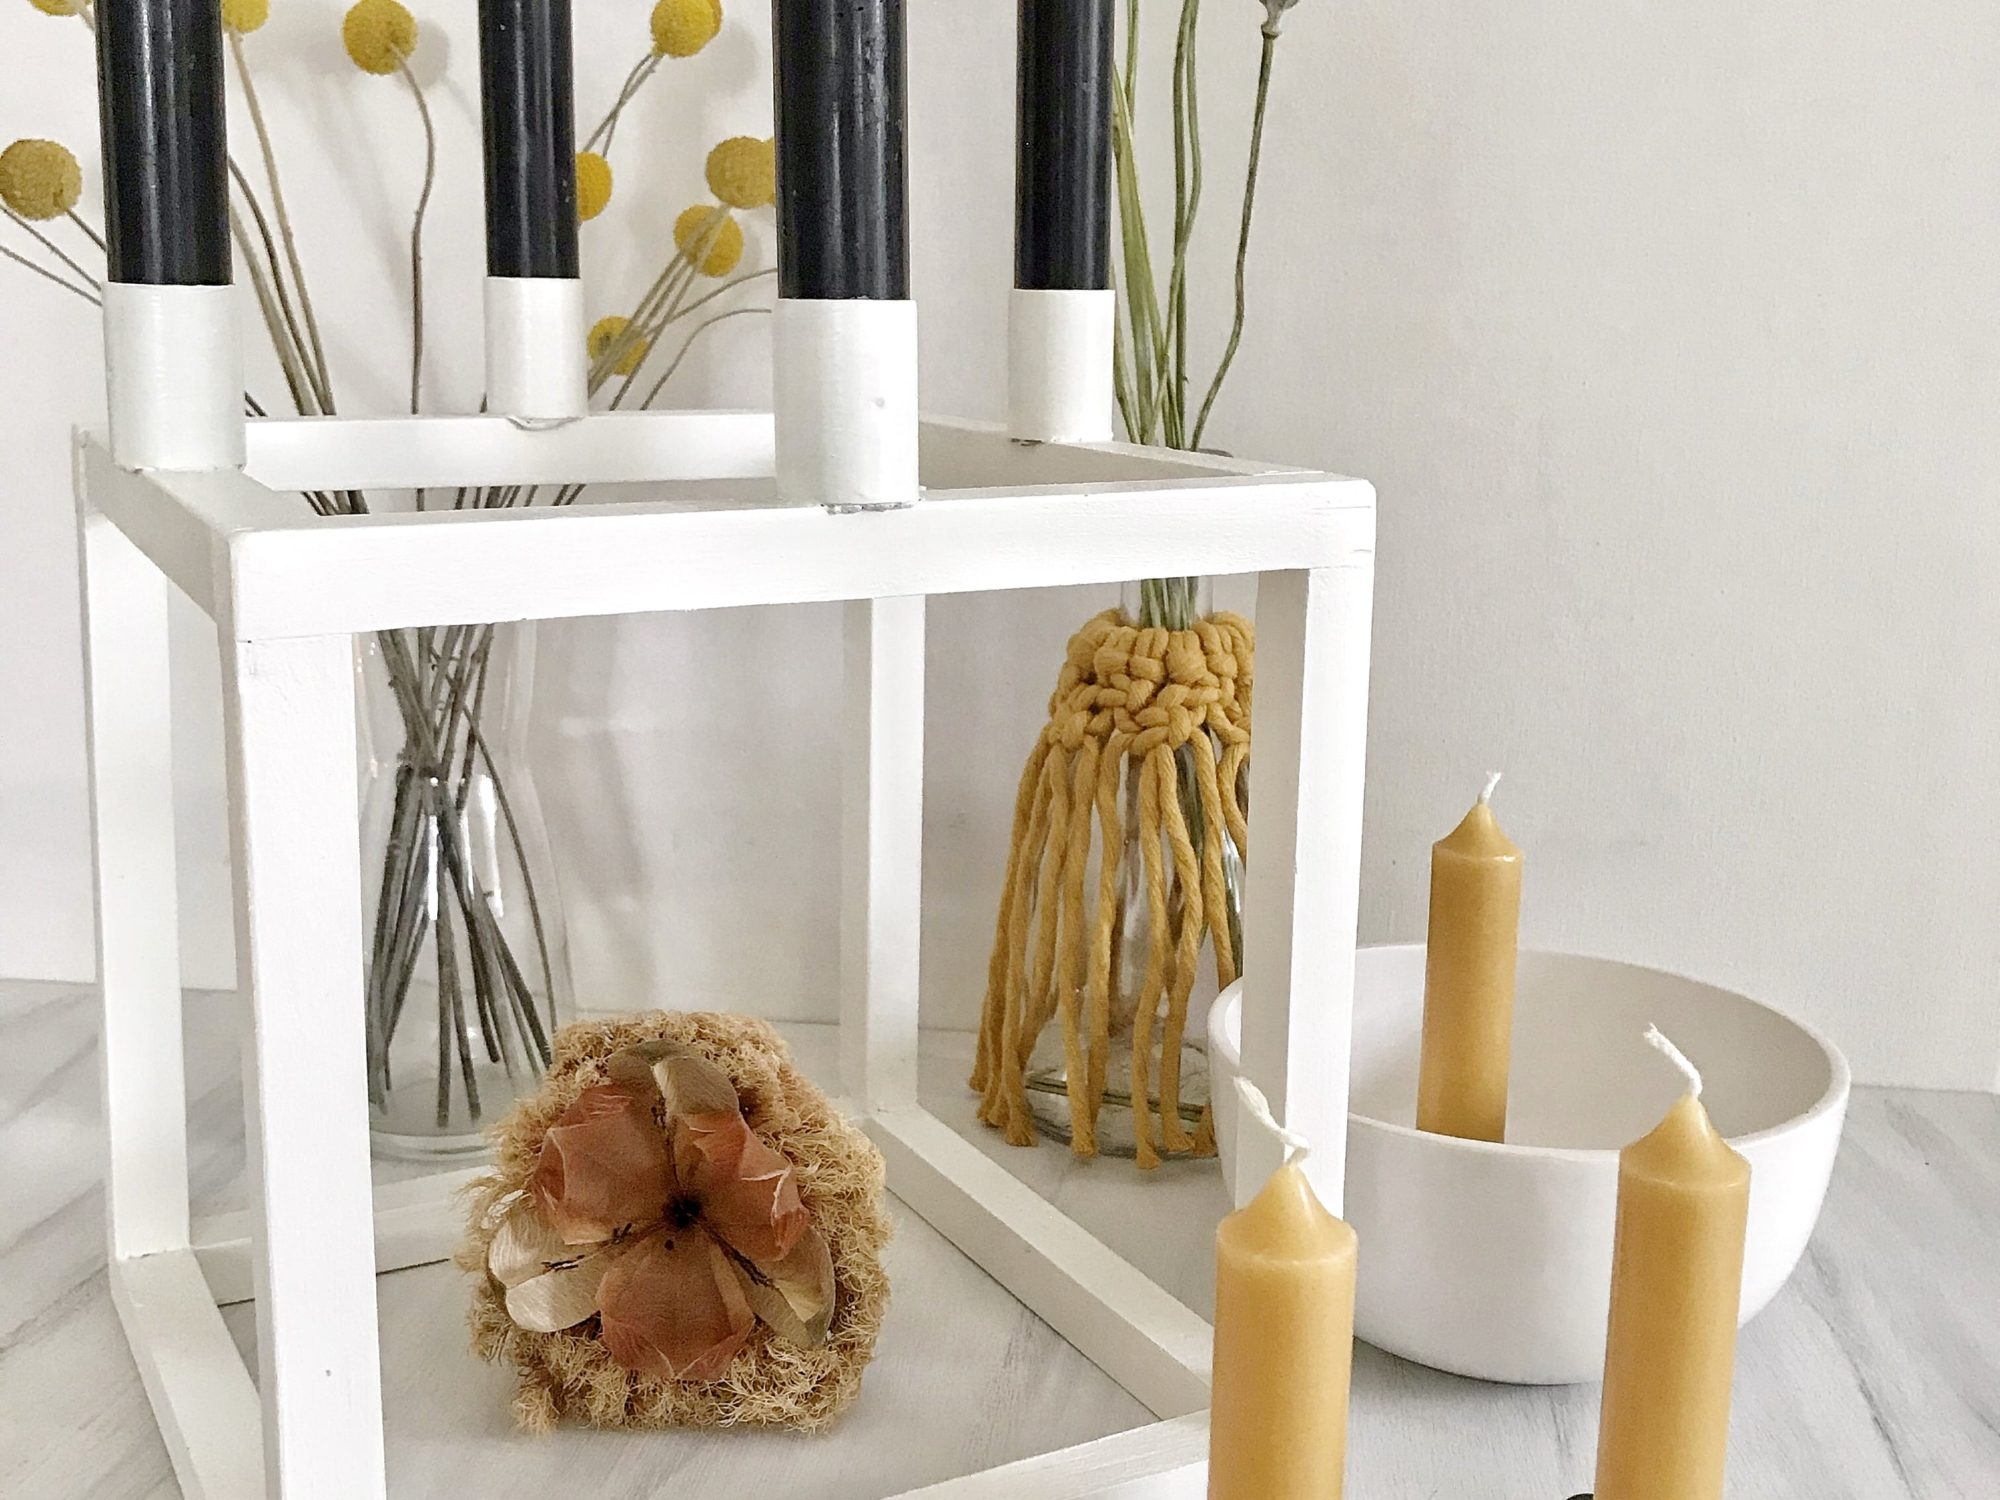 DIY: Drei Kerzenleuchter im skandinavischen Design. Skandinavische Kerzenhalter selber machen. Günstige Kerzenständer basteln. #chalet8 #kerzenleuchter #kerzenständer #kerzenhalter #skandidesign